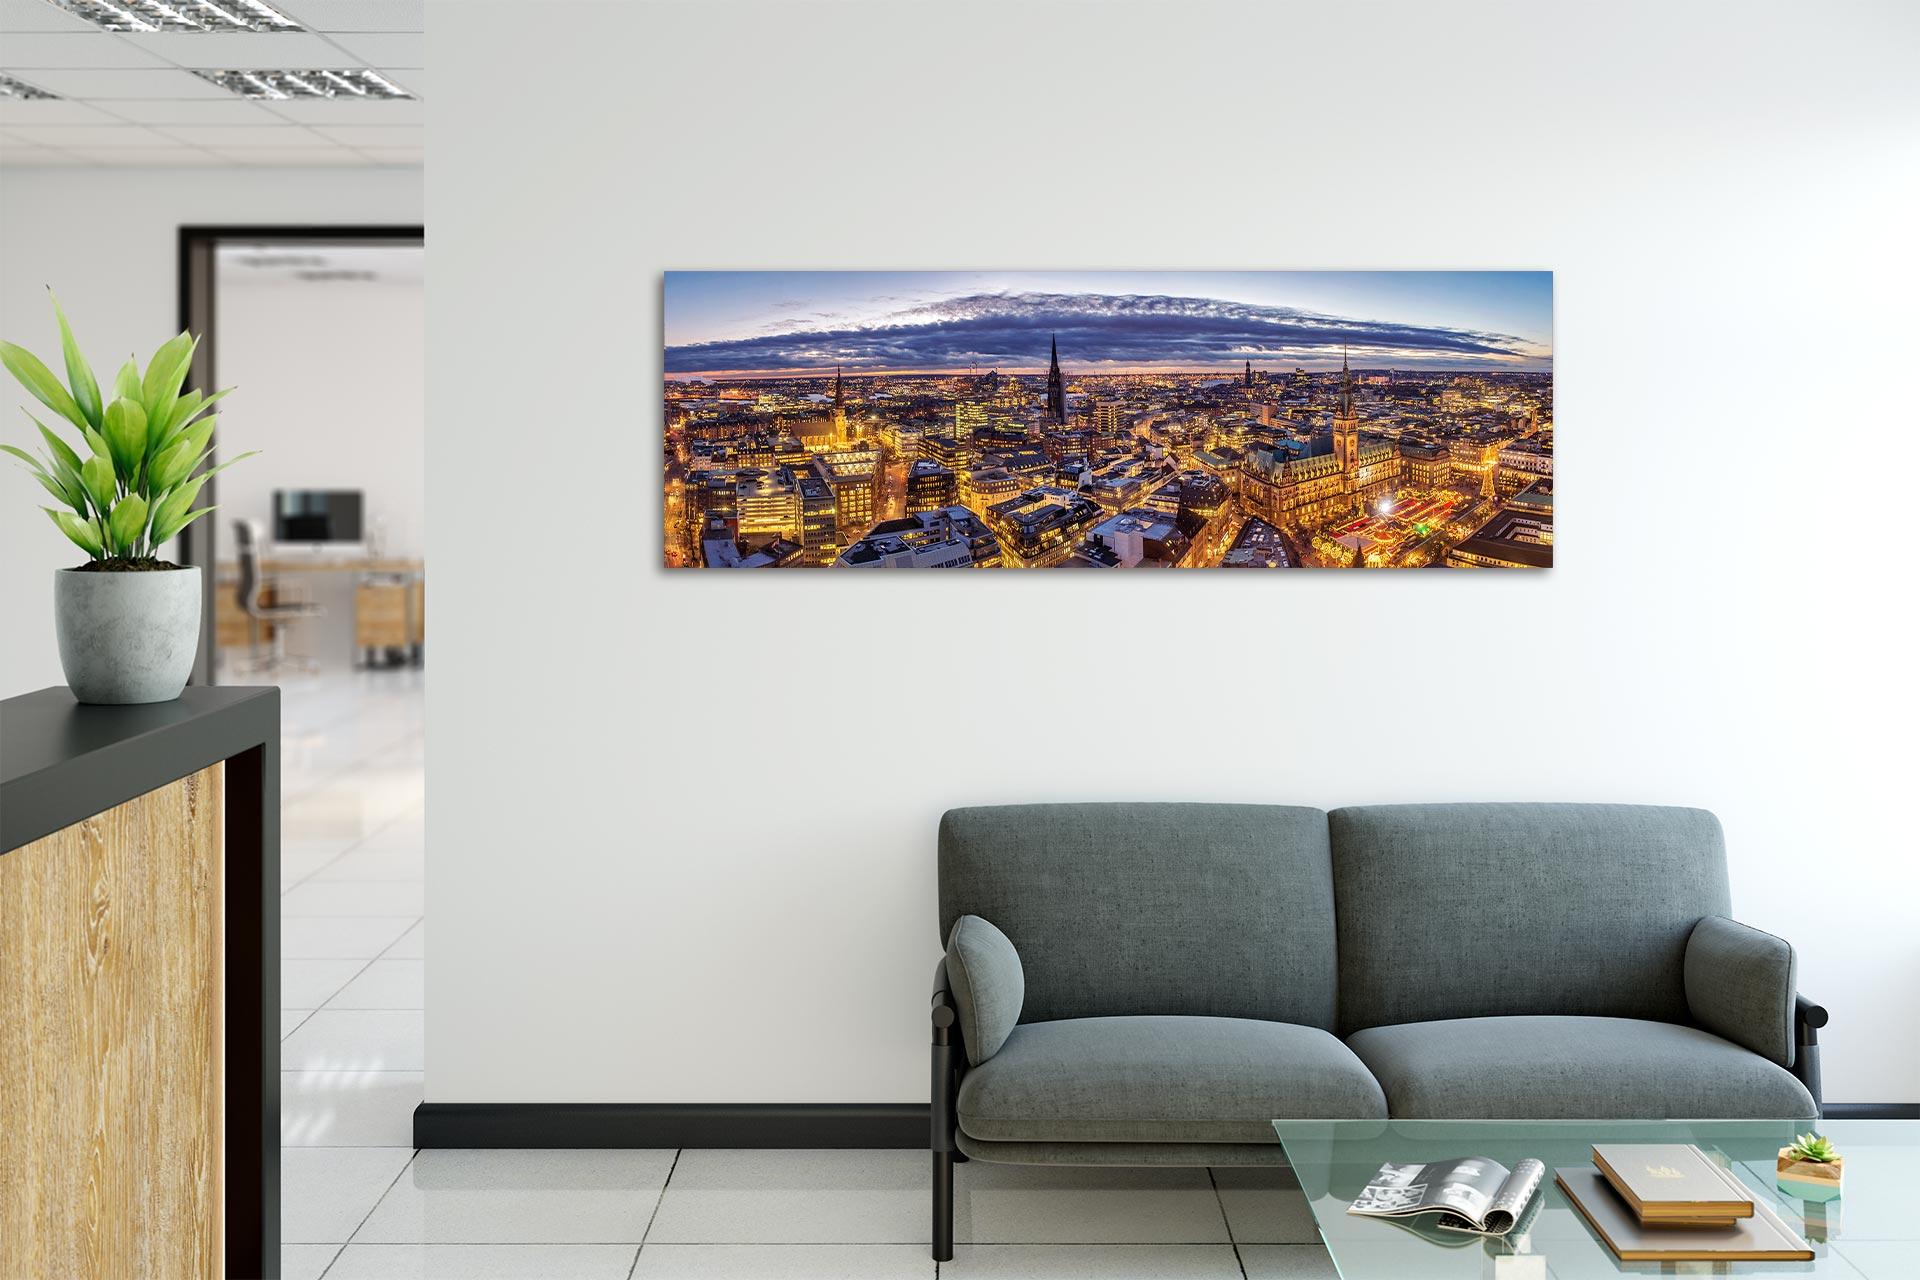 PSW023-panorama-hamburg-wandbild-leinwand-acrylglas-aludibond-empfang